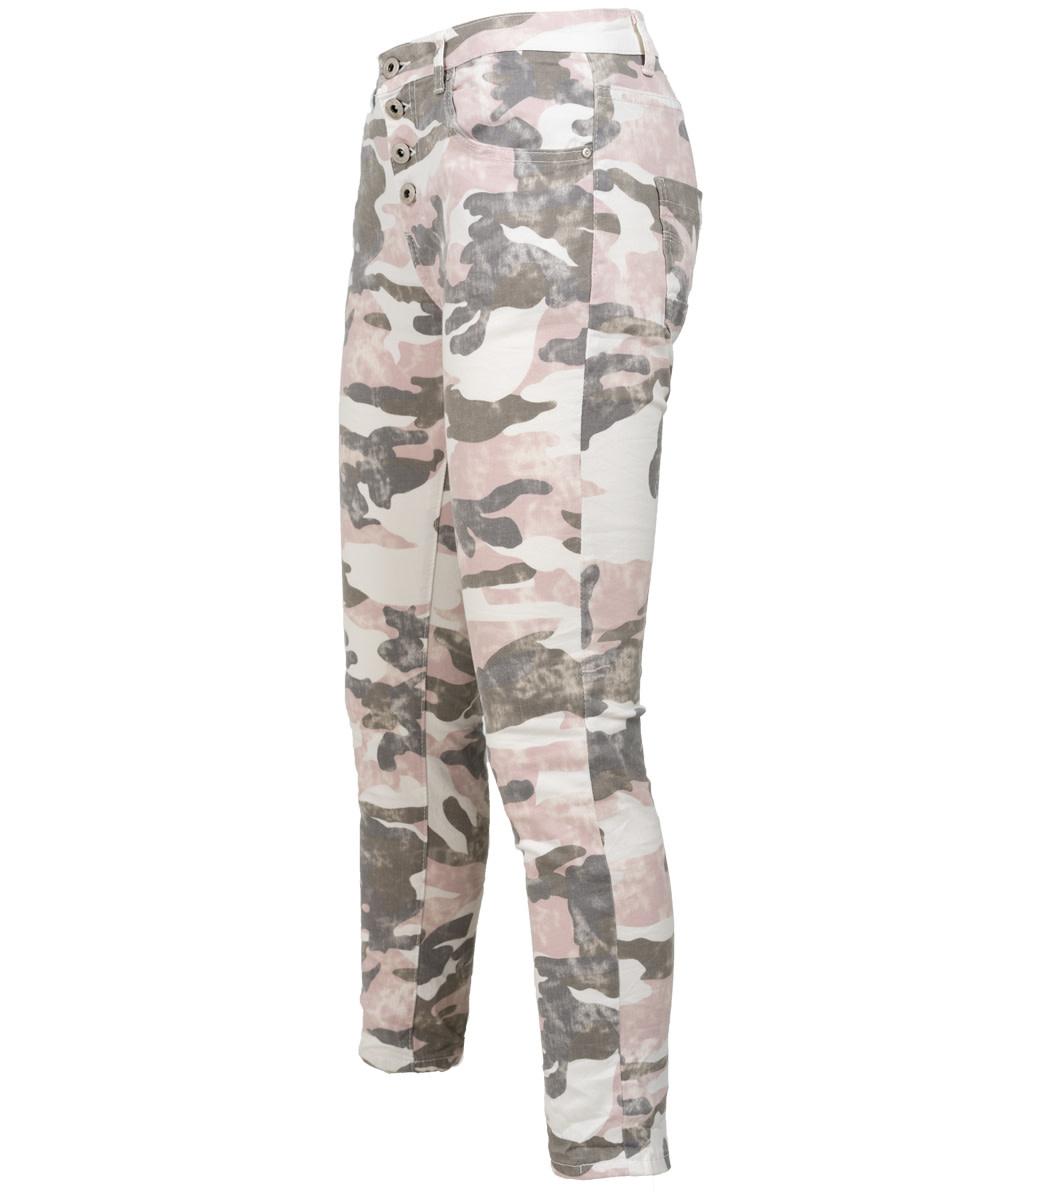 Wonderbaarlijk jog jeans grijs/roze camouflage - Wannahavesfashion RE-44